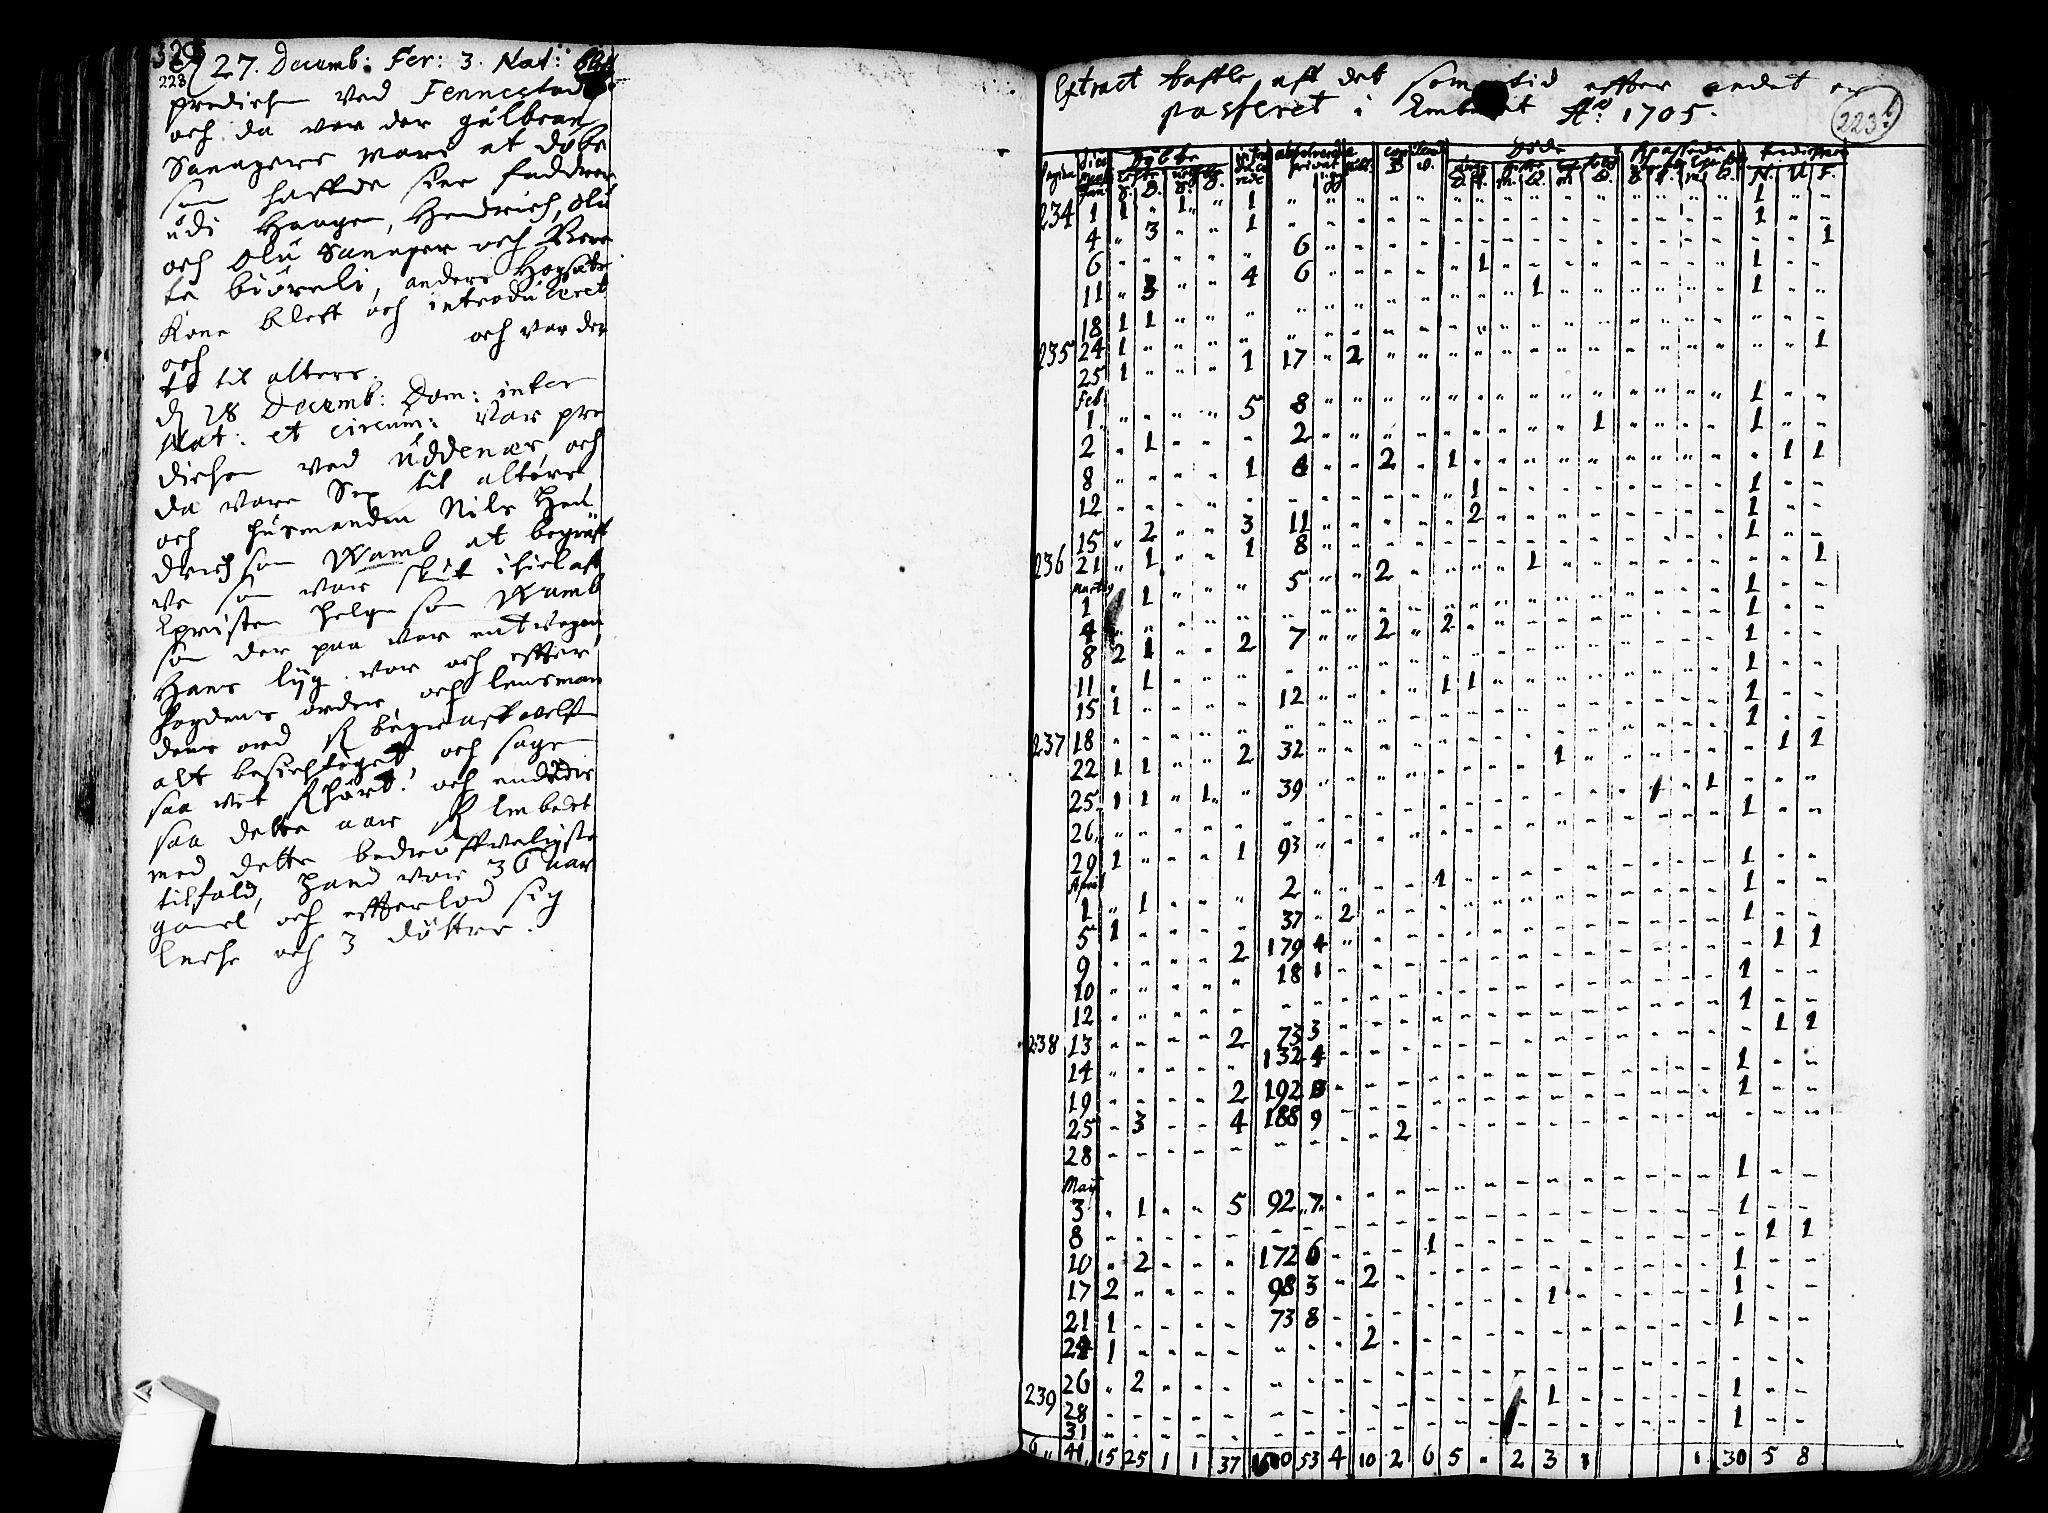 SAO, Nes prestekontor Kirkebøker, F/Fa/L0001: Parish register (official) no. I 1, 1689-1716, p. 223a-223b